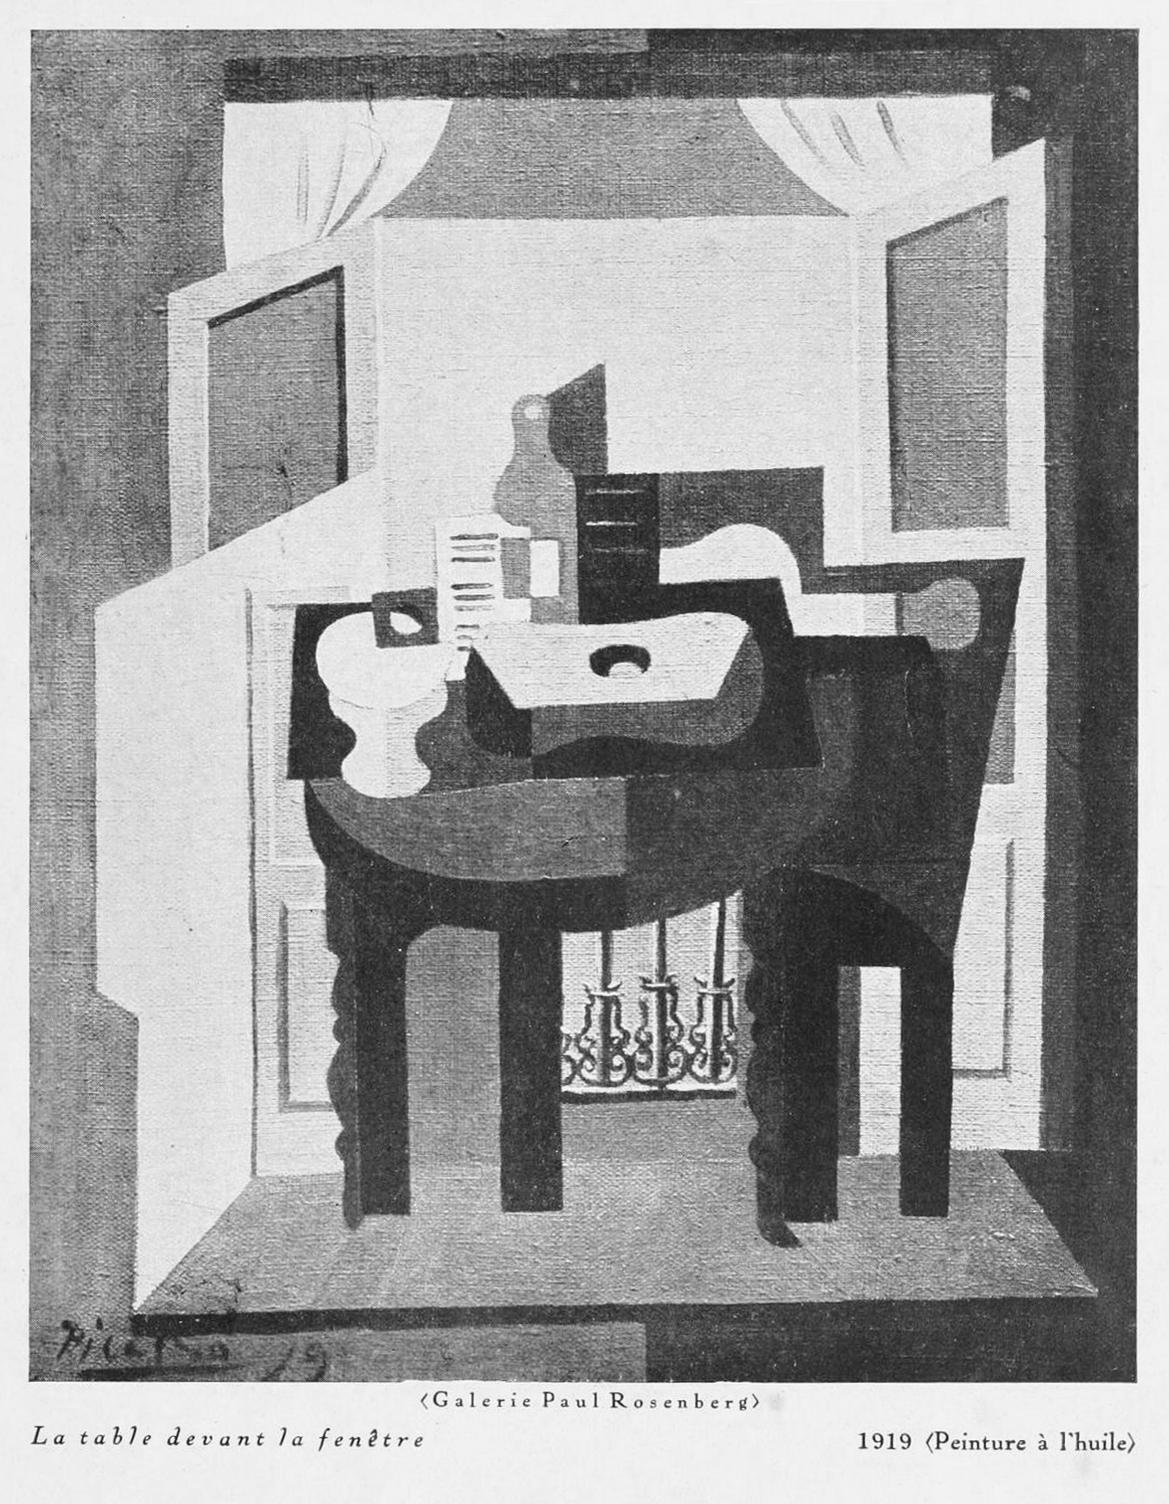 File:Pablo Picasso, 10, La table devant la fenêtre (The Table in